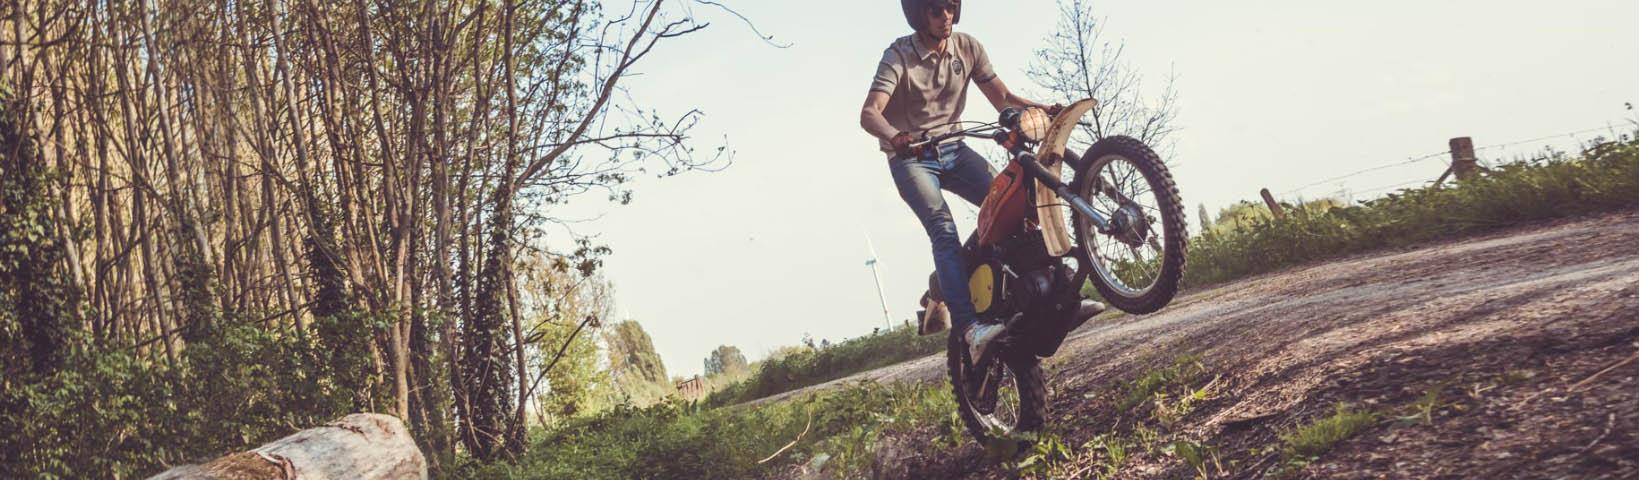 polo pour bikers